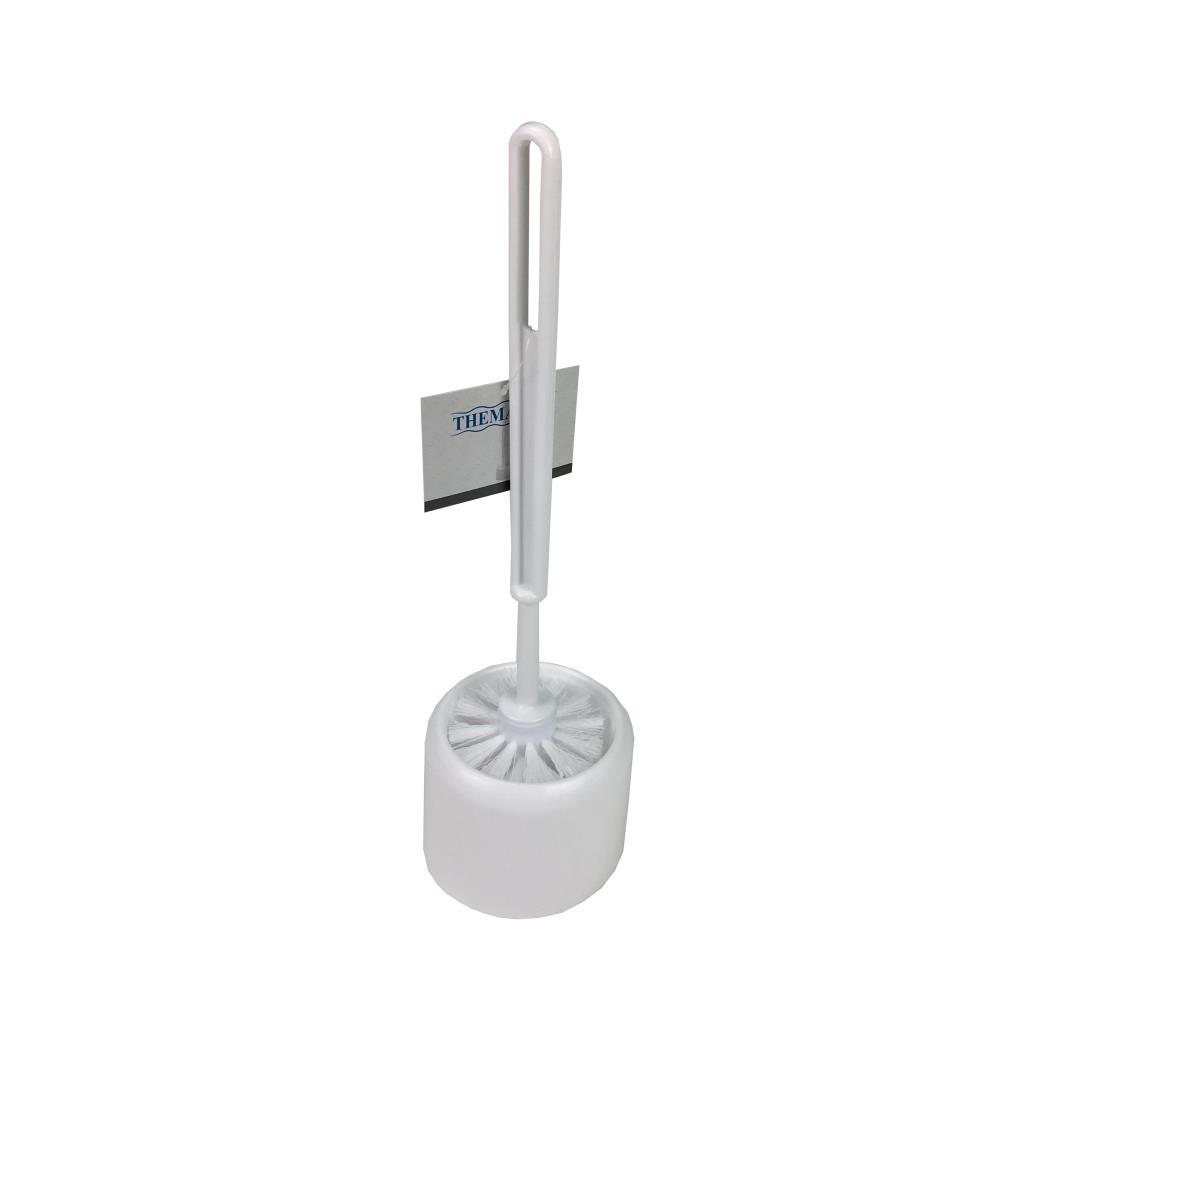 3 x Toilettenbürste Klobürste Bürstengarnitur Bürste WC-Bürste ,Thema Lux,000051116272, 0676424768668